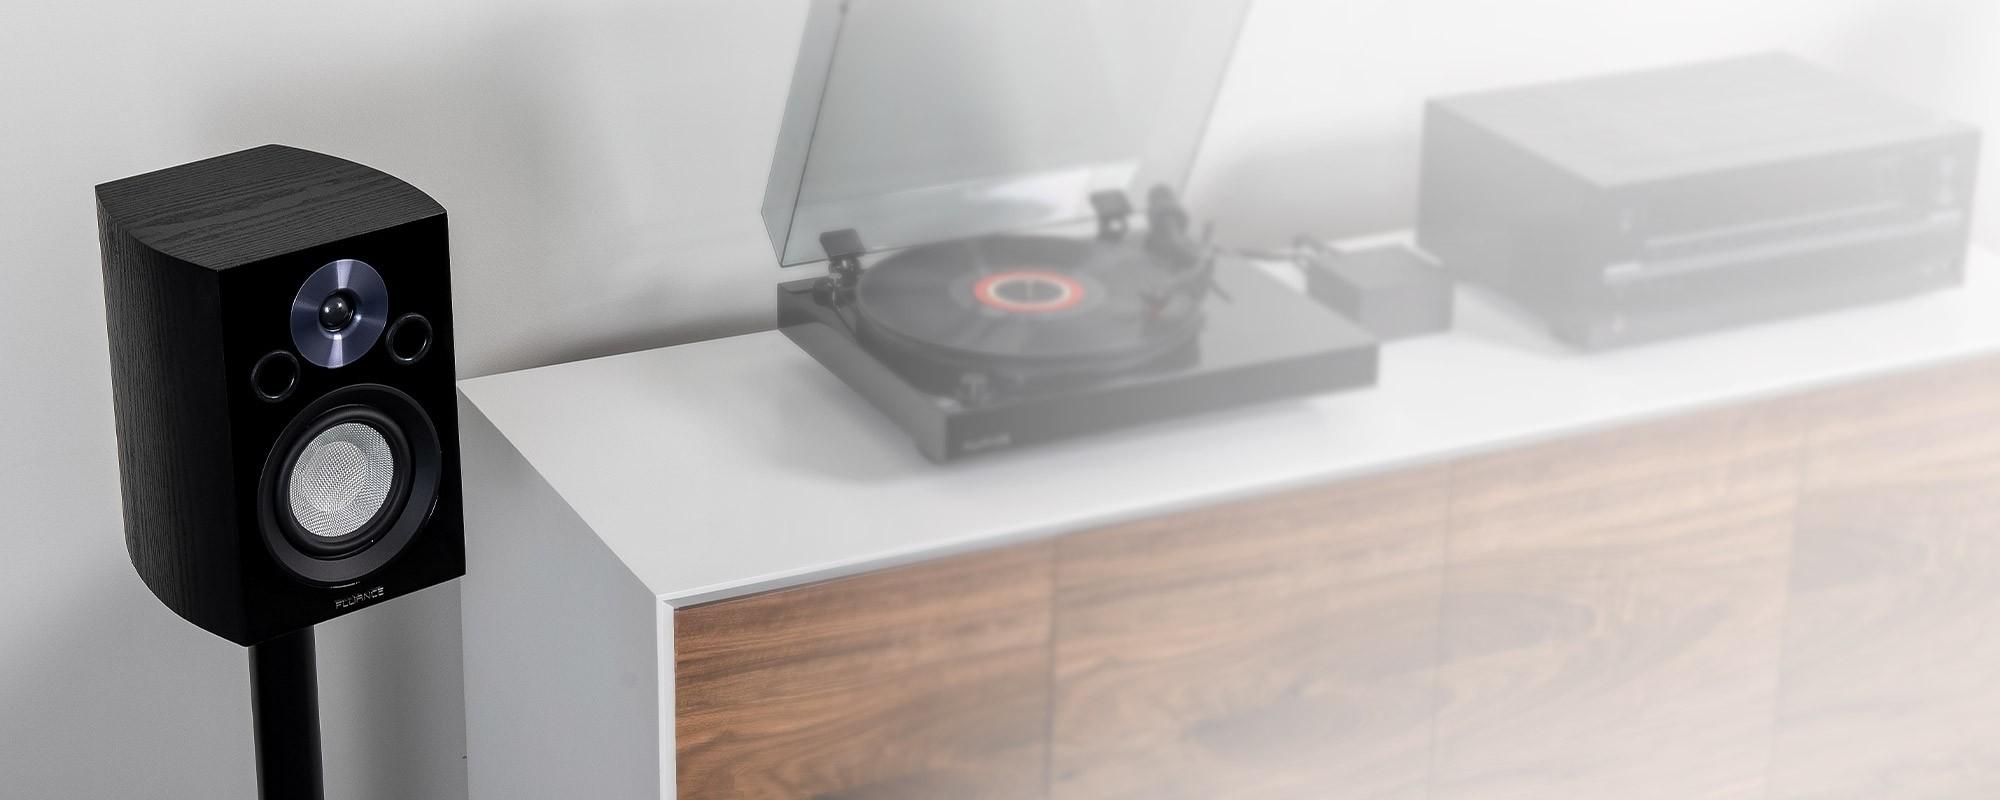 Fluance XL8S Bookshelf Speaker with record player